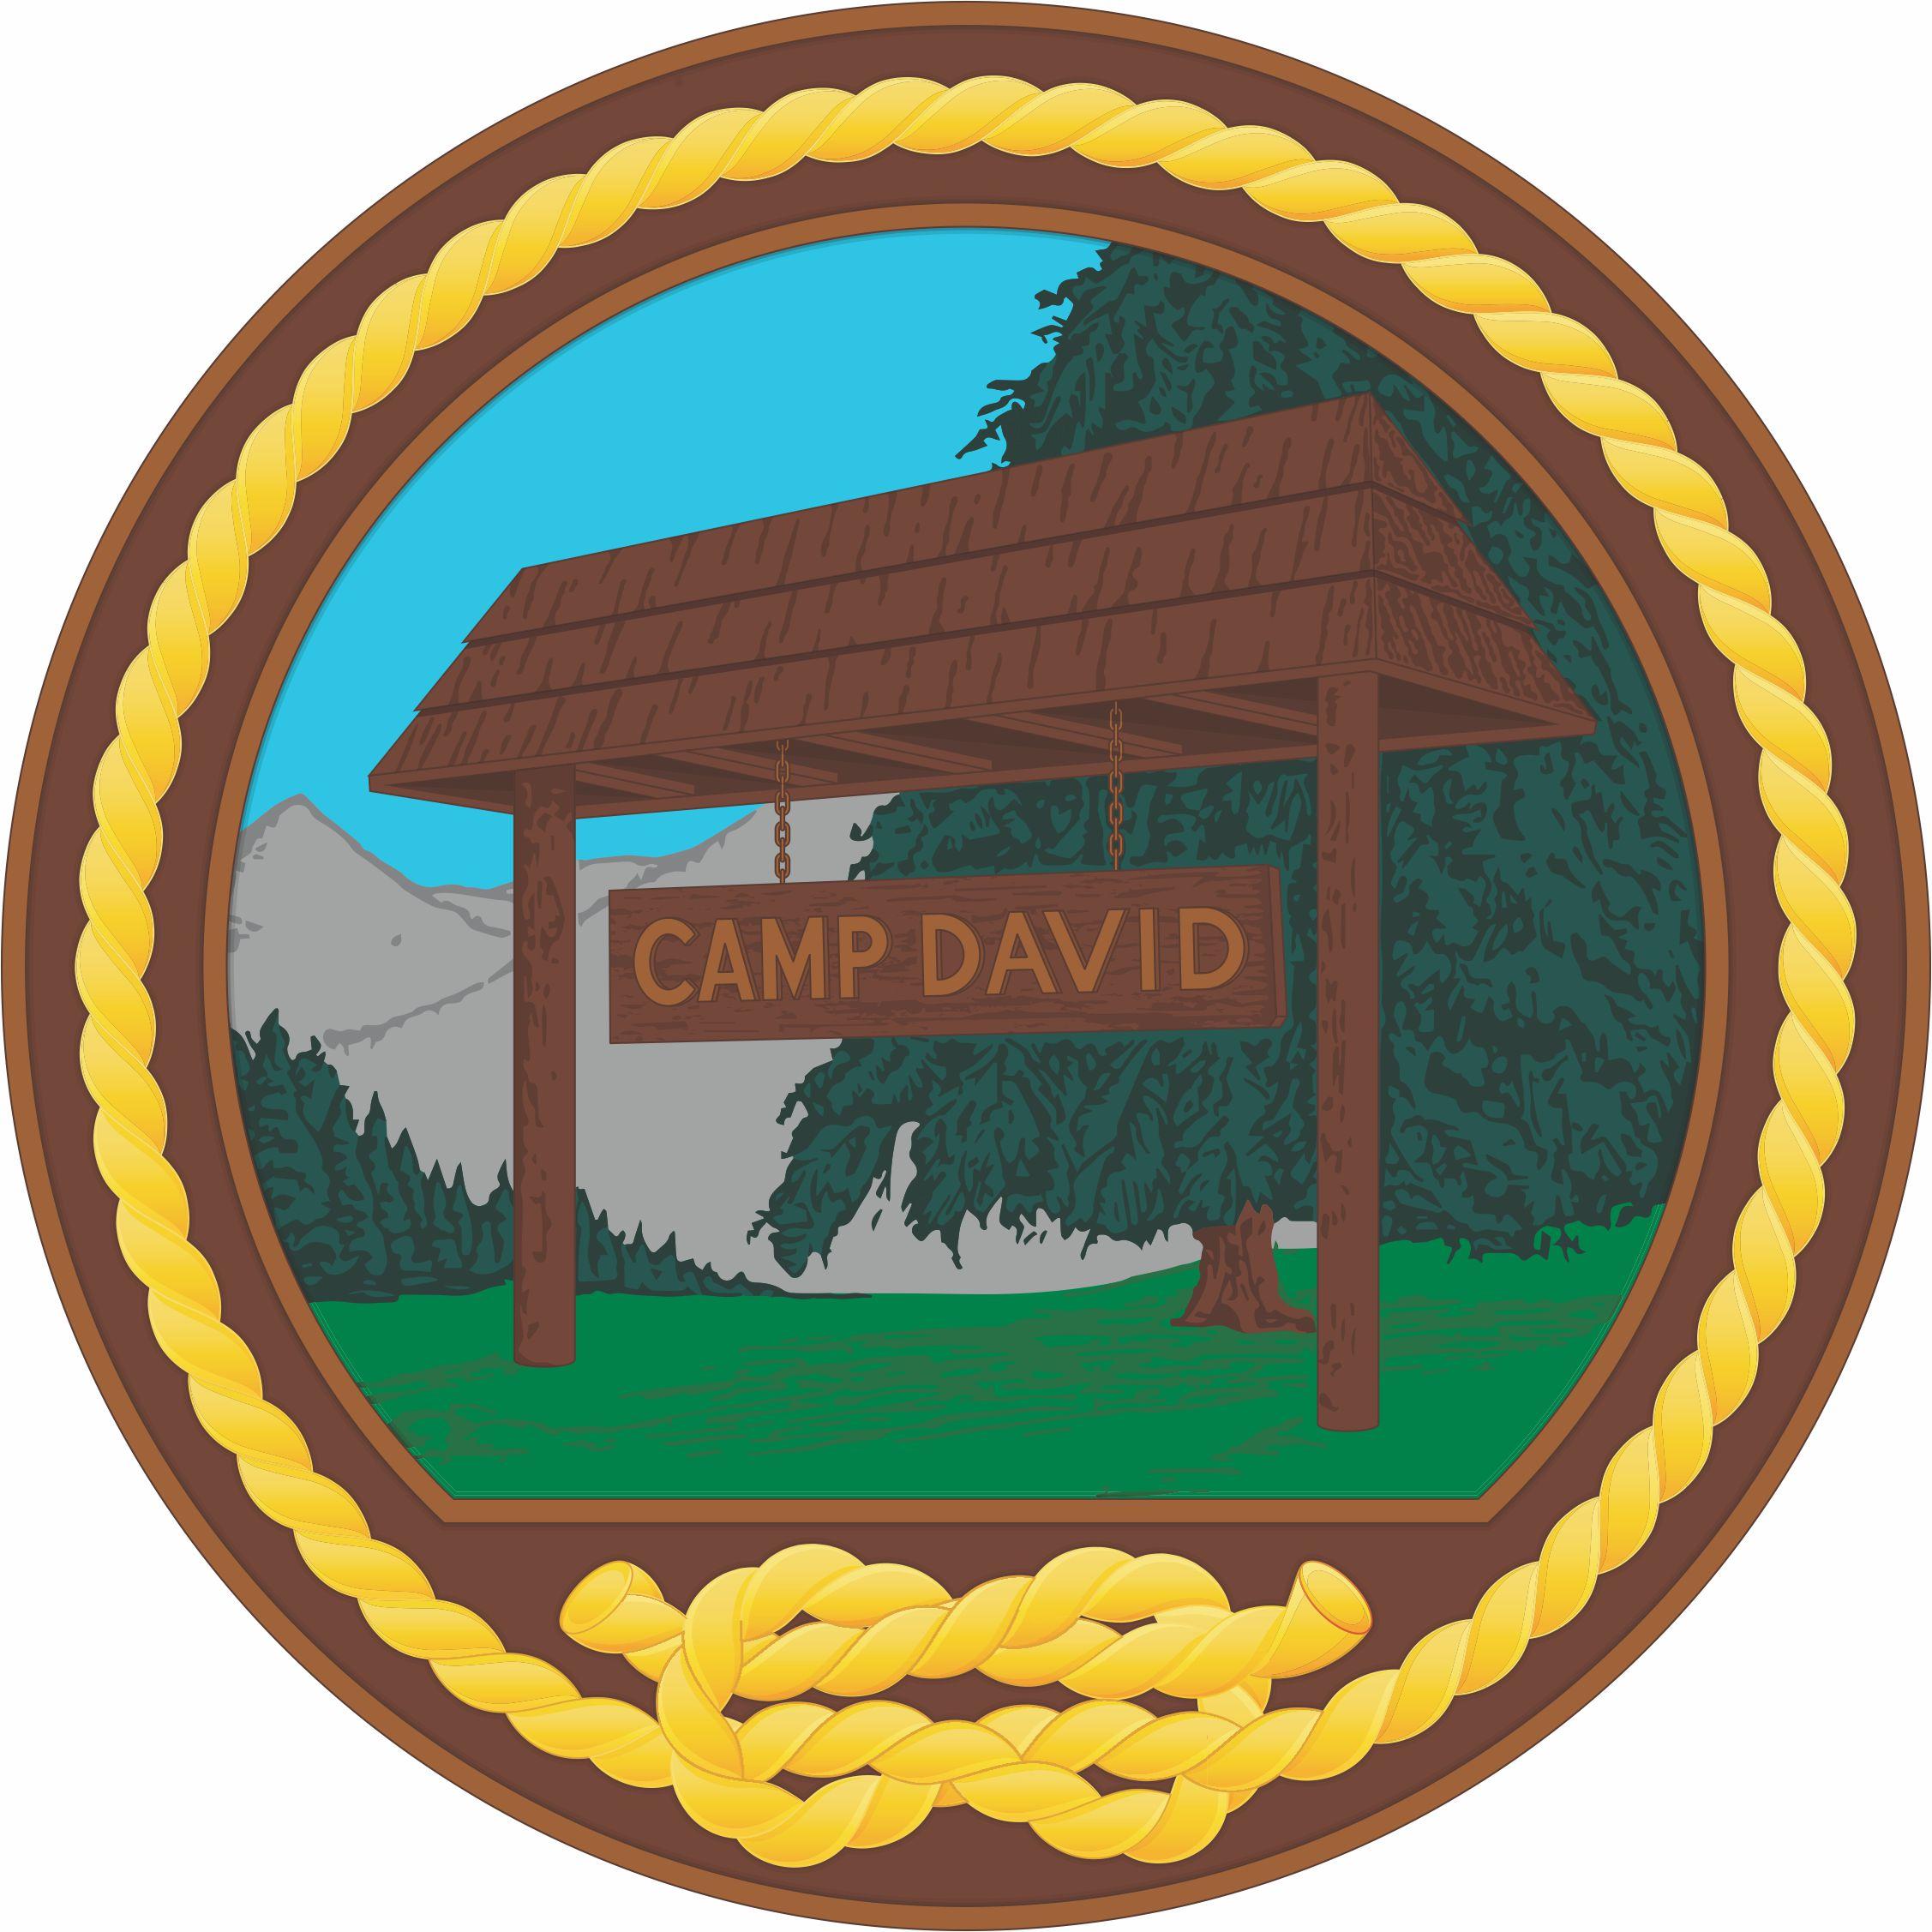 Camp David Wikipedia